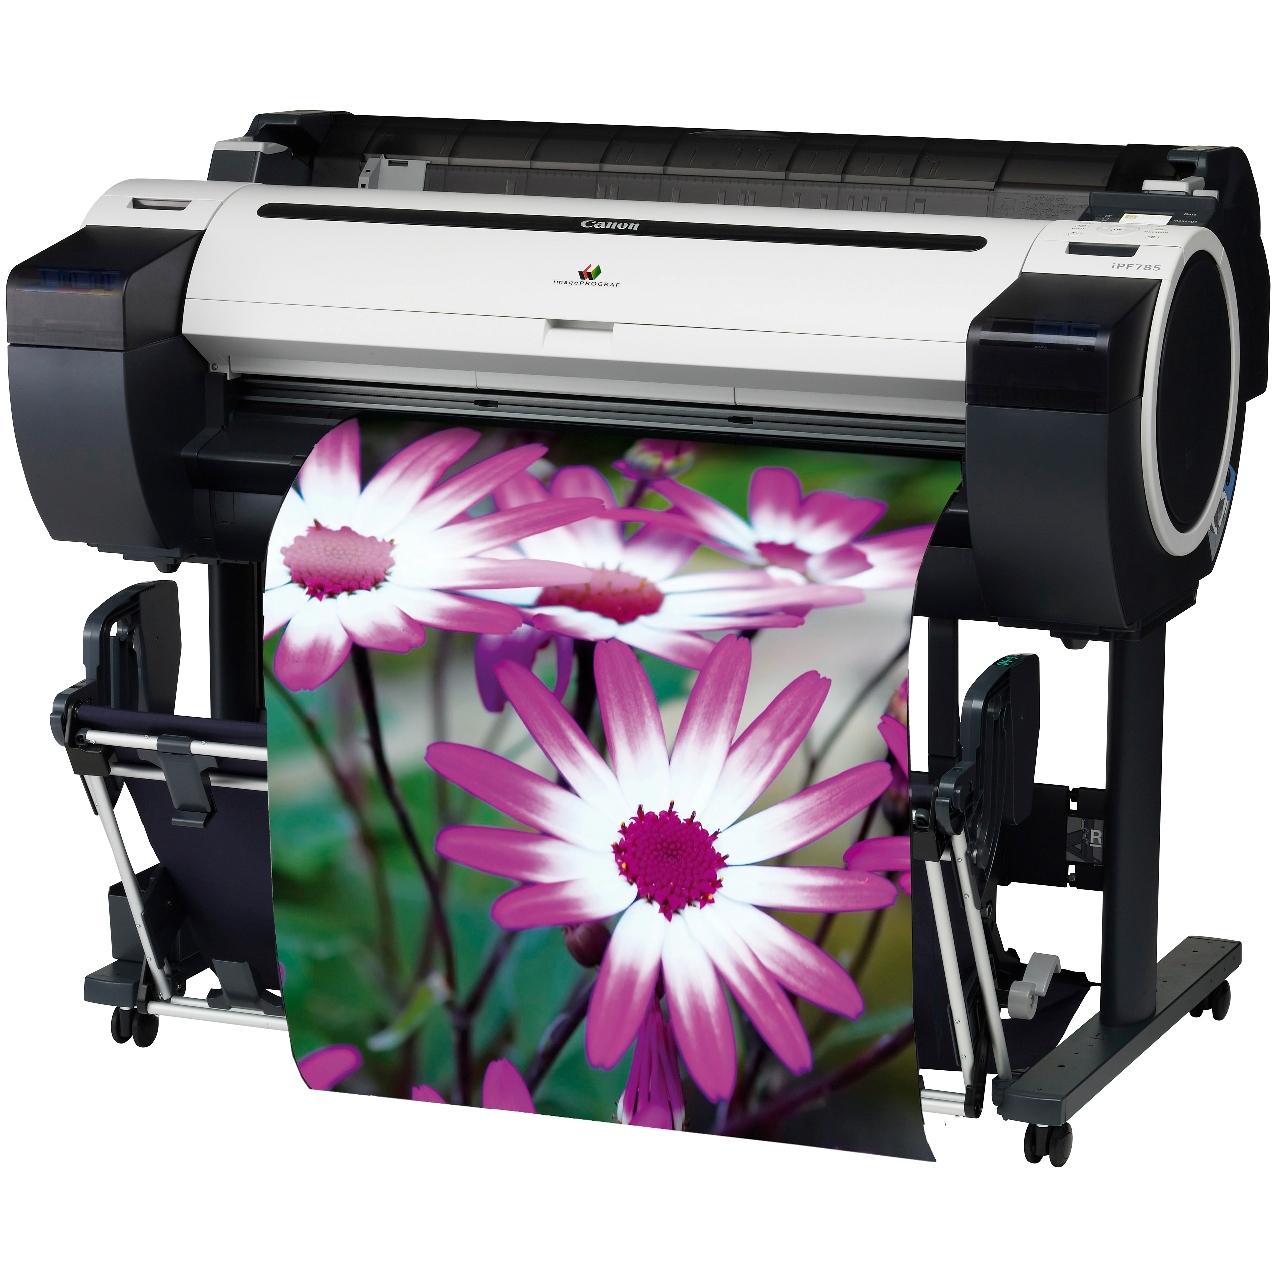 Canon IPF785 CAD Printer - 36in - 8966B003AA